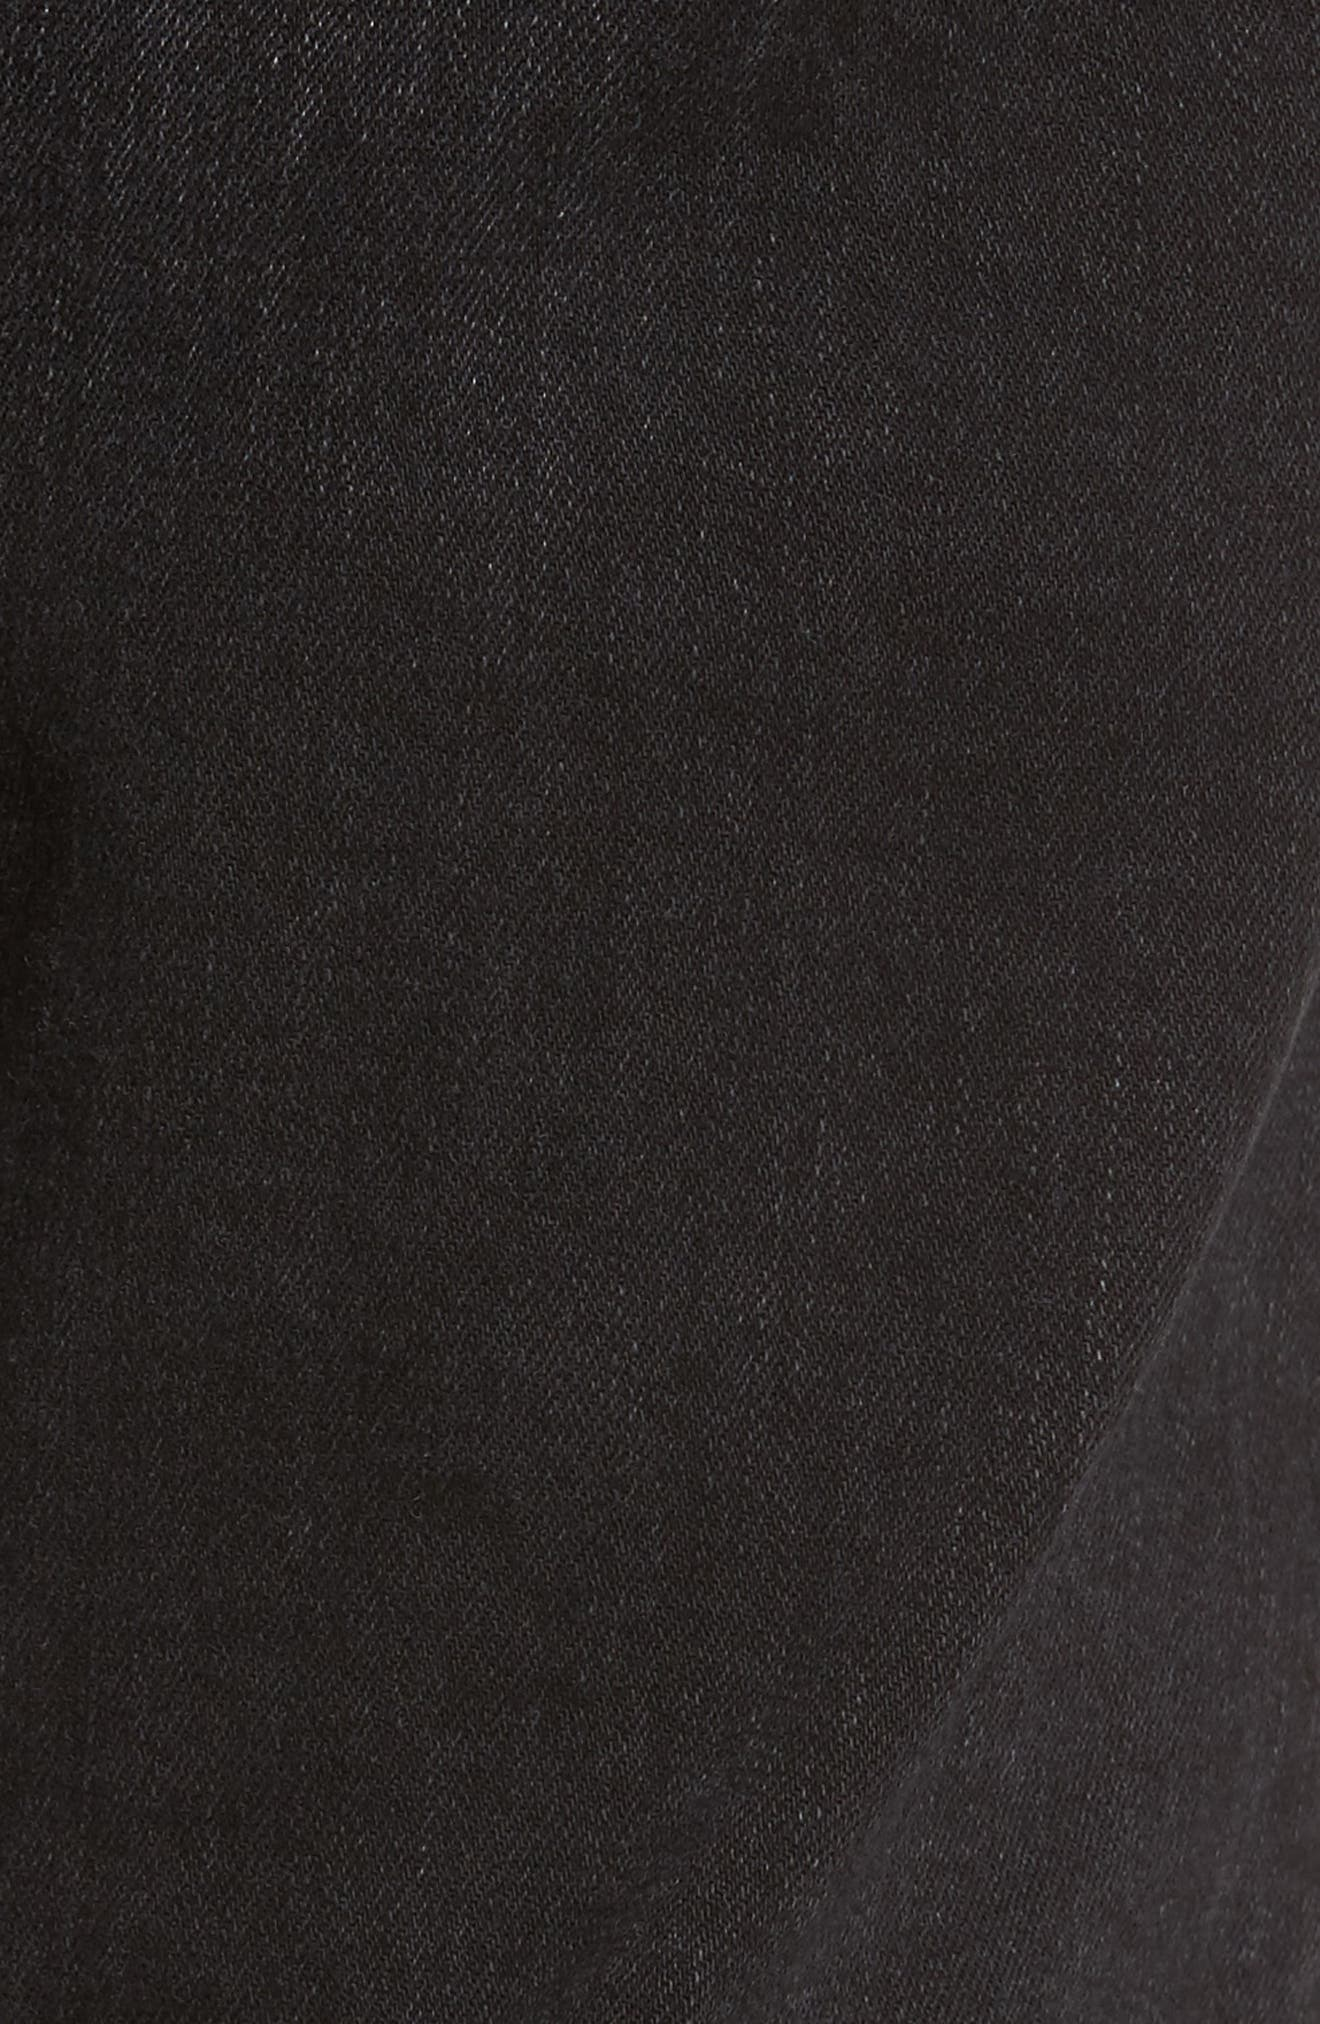 Clark Slim Straight Leg Jeans,                             Alternate thumbnail 5, color,                             Organic Worn Black